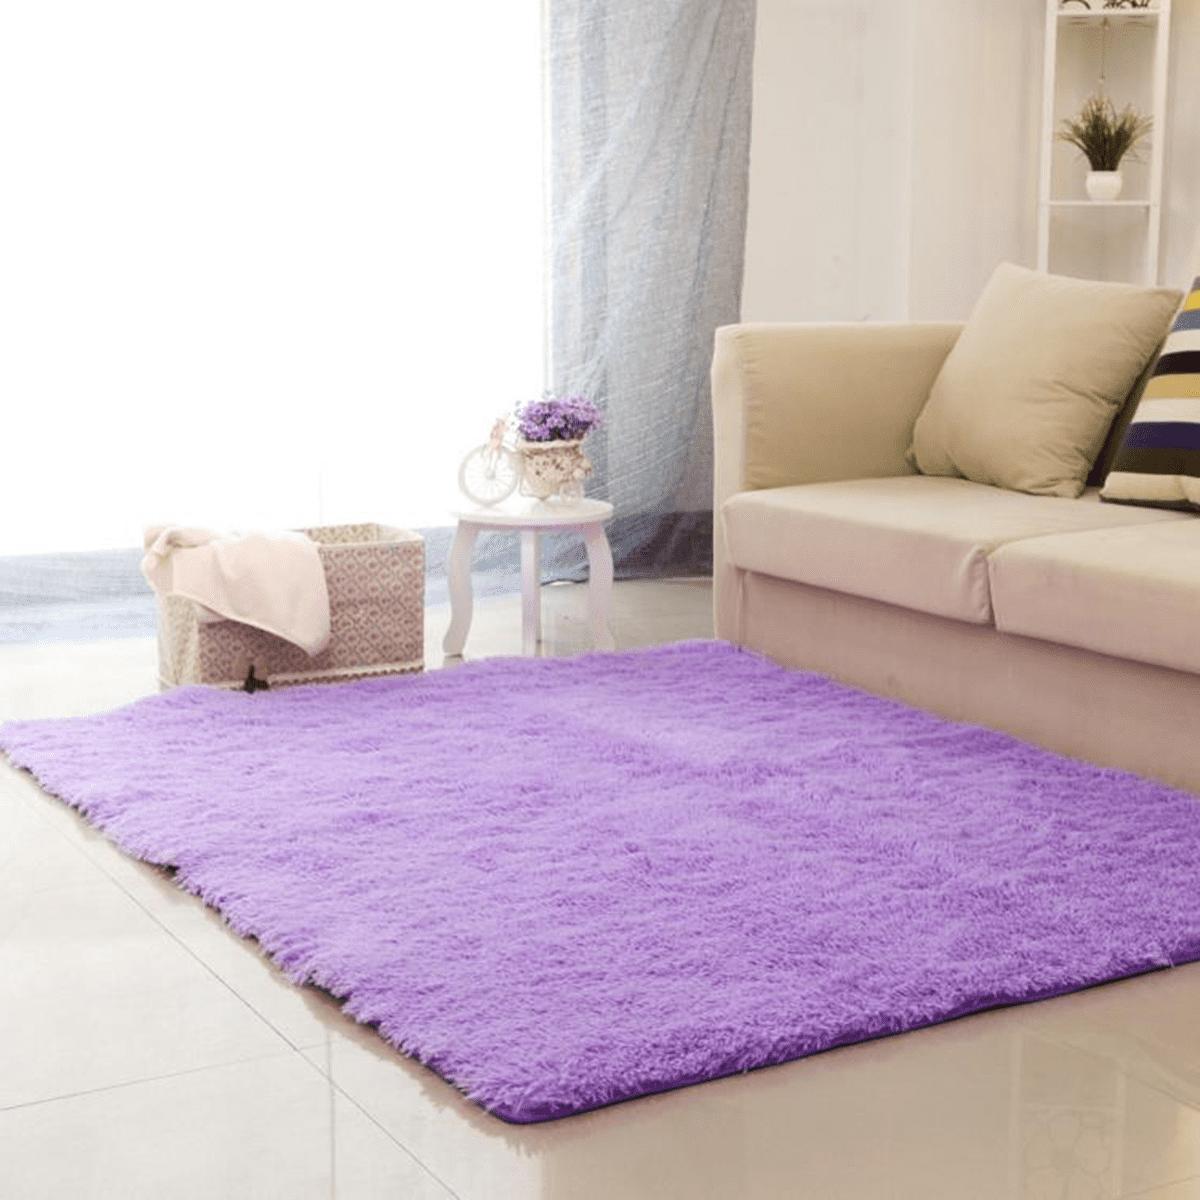 Moaere Super Soft Indoor Modern Shag Area Rug Silky Smooth